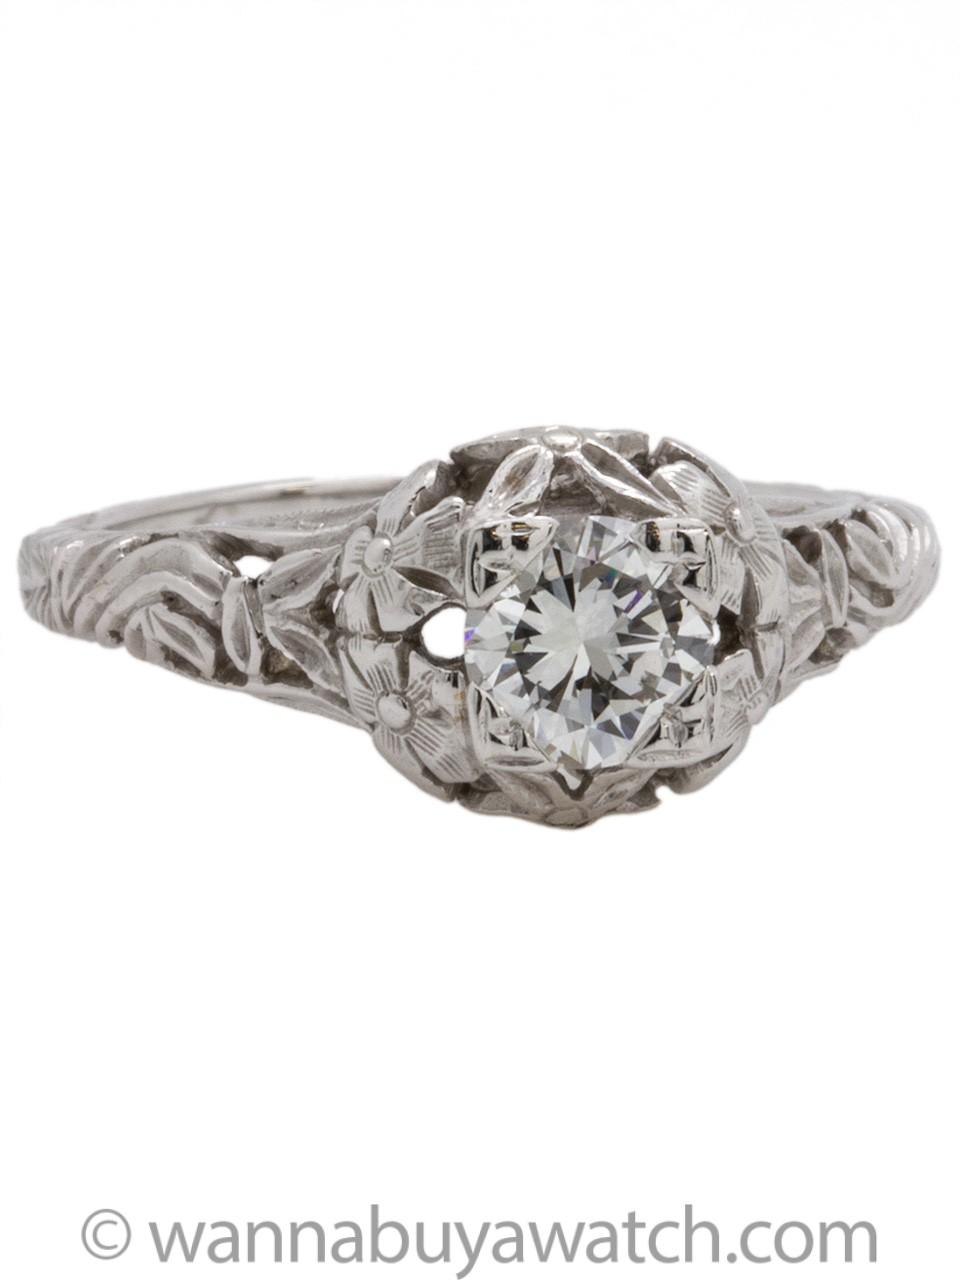 Vintage Style 14K WG Engagement Ring 0.53ct Modern Brilliant Cut  E-VS2